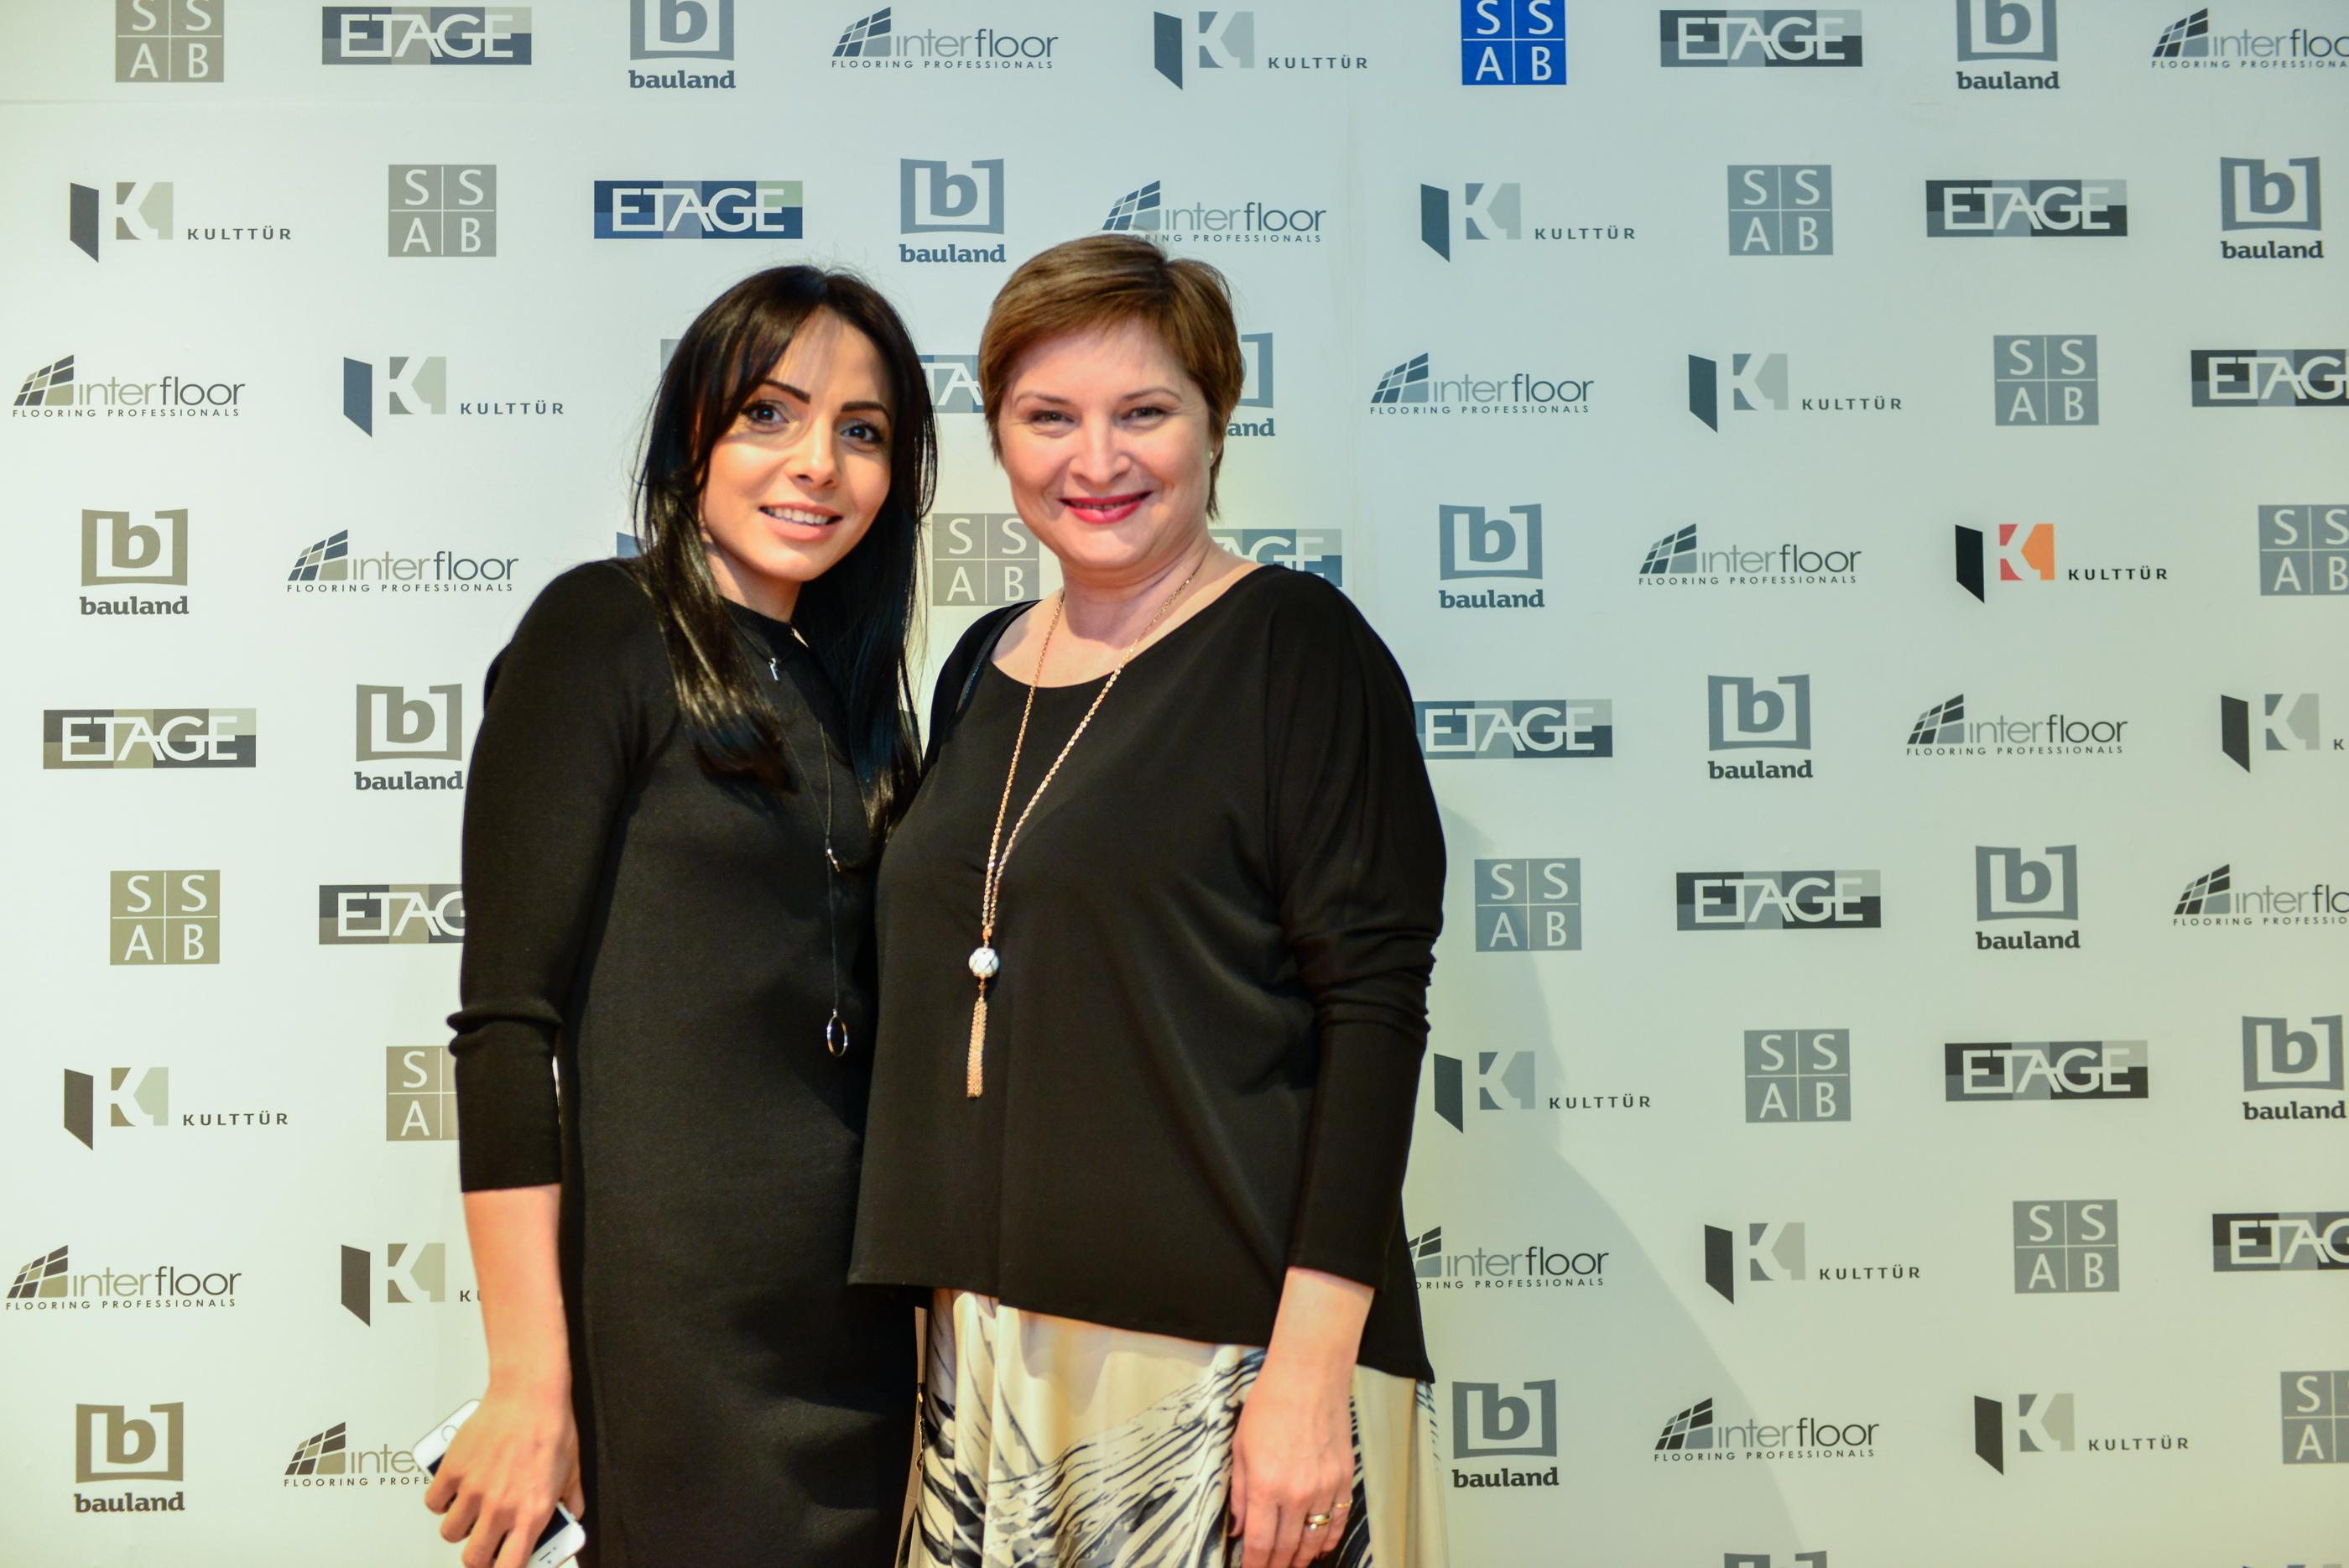 Amalia Nedelcu - Cristina Stanciulescu - S-a deschis Showroom-ul ETAGE din strada Nerva Traian, nr.5